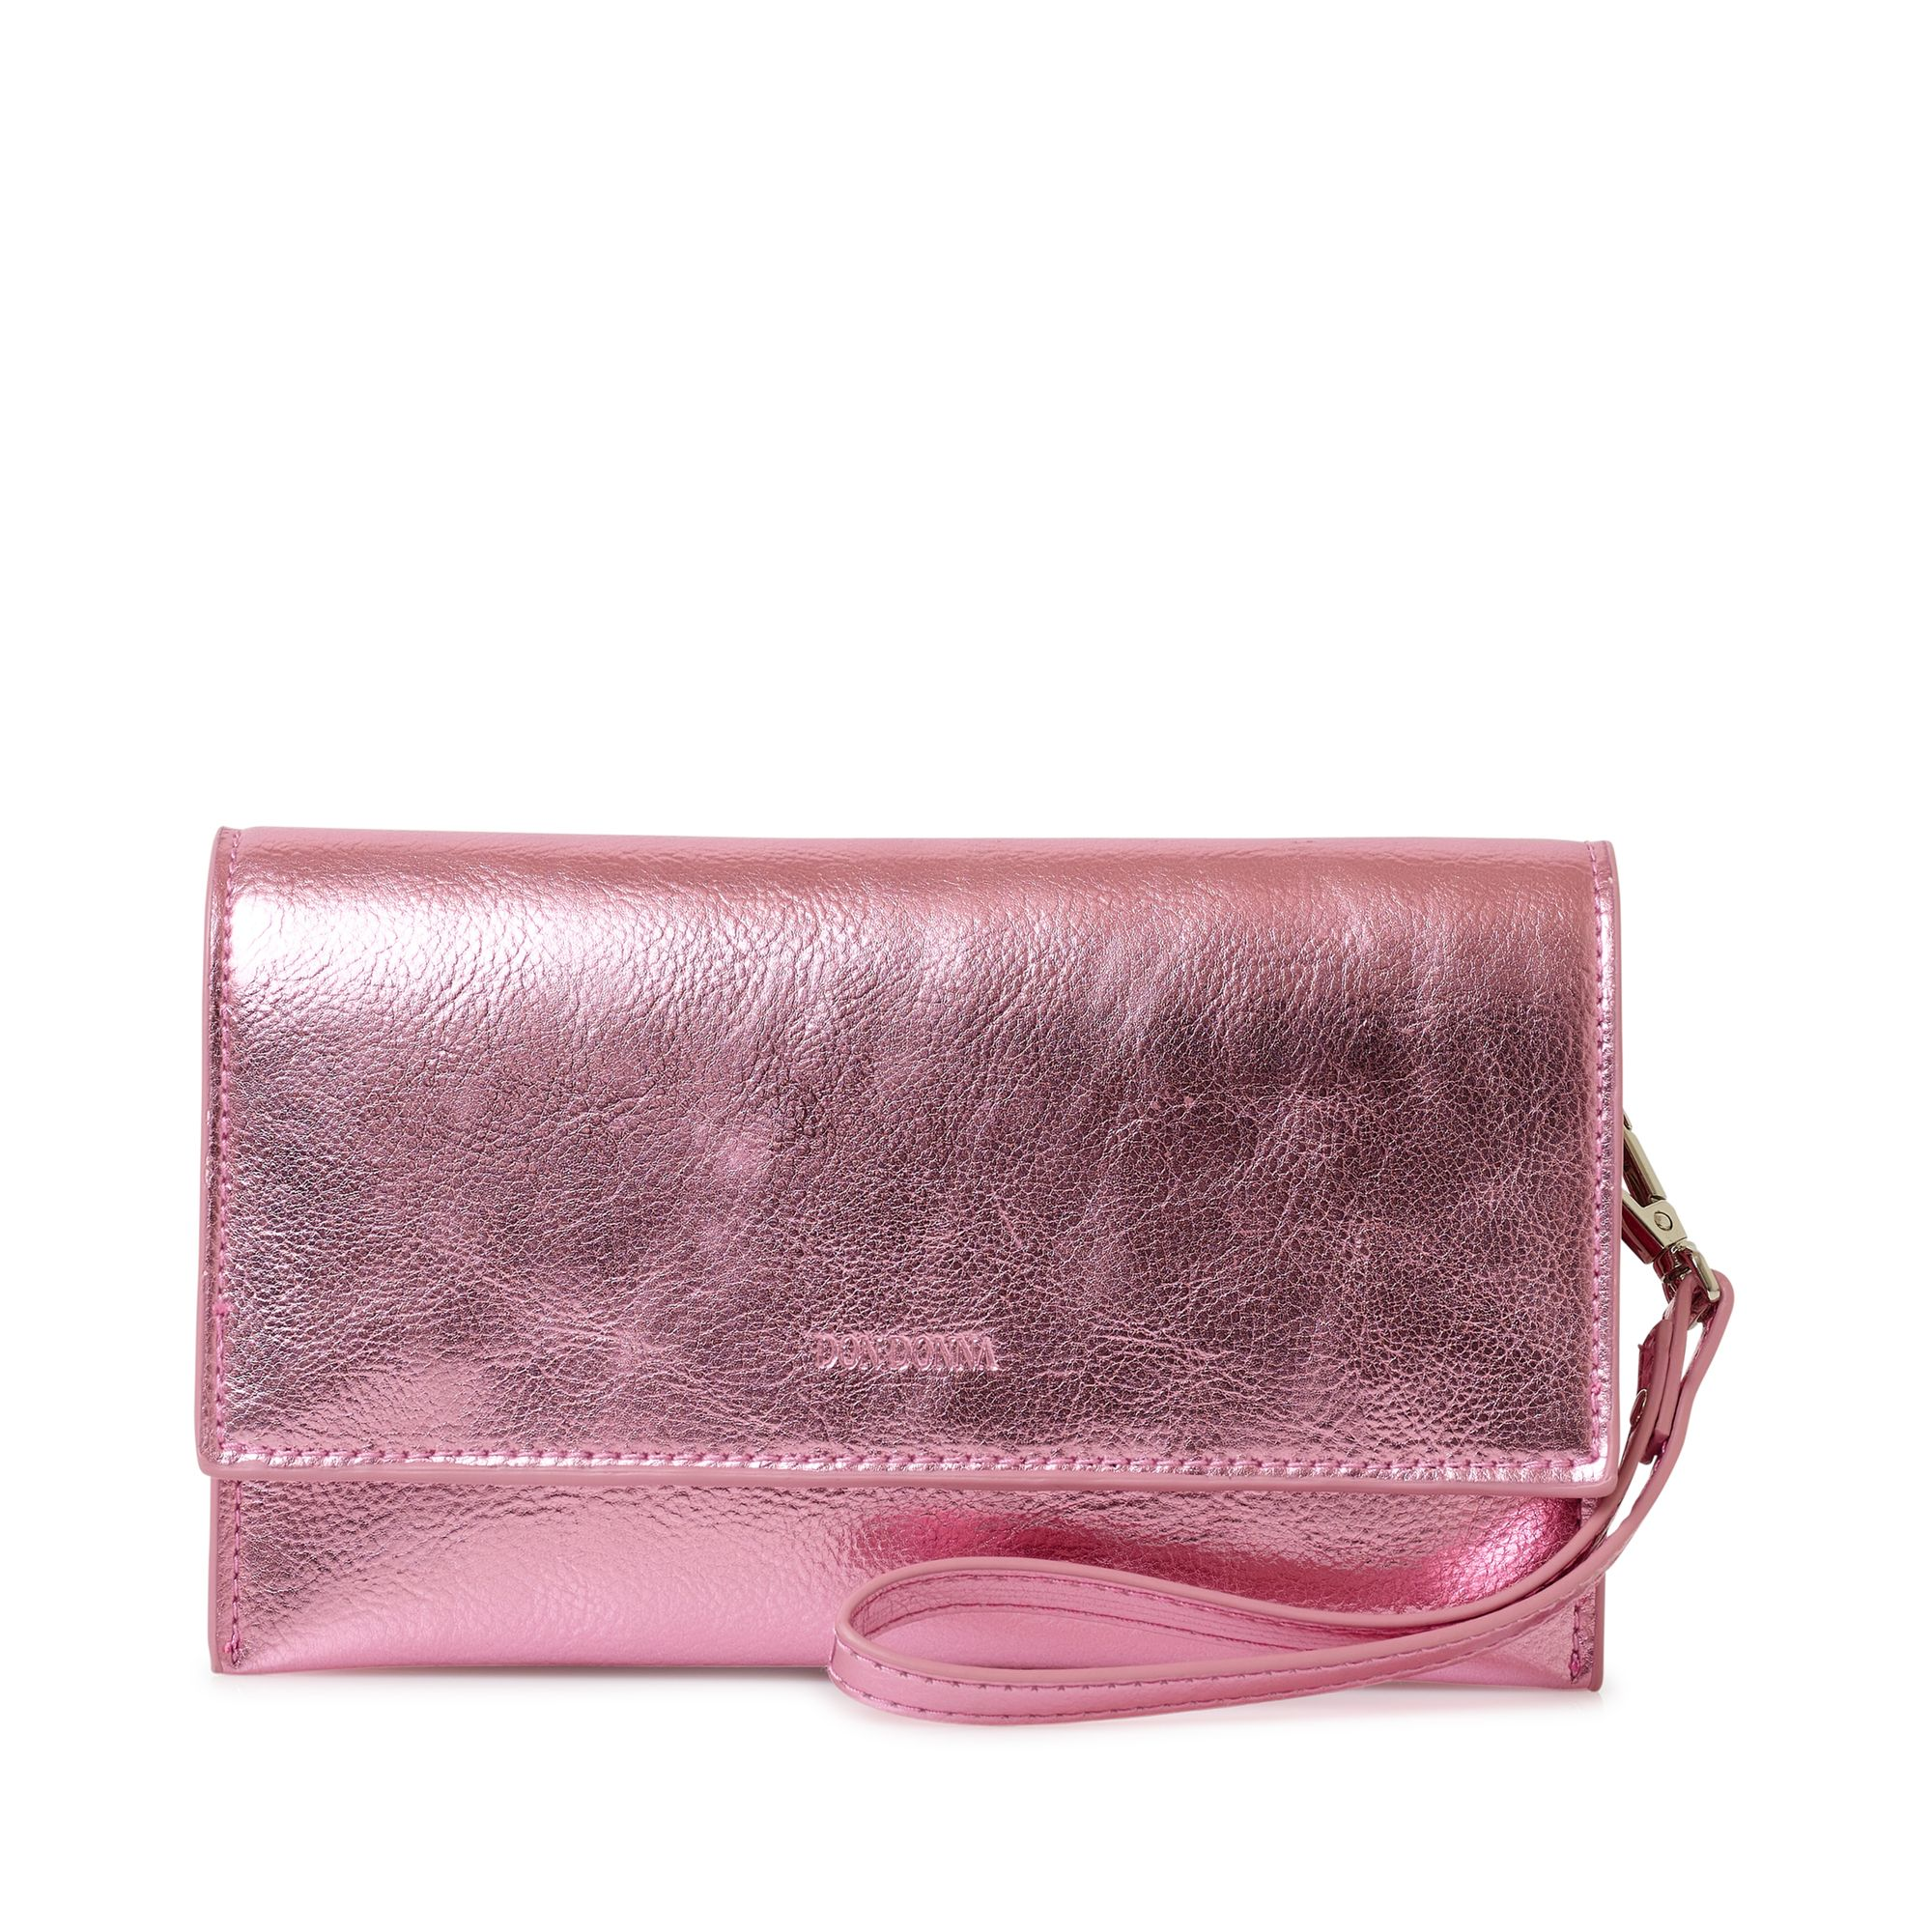 Don Donna Amy liten kuvertväska, Rosa